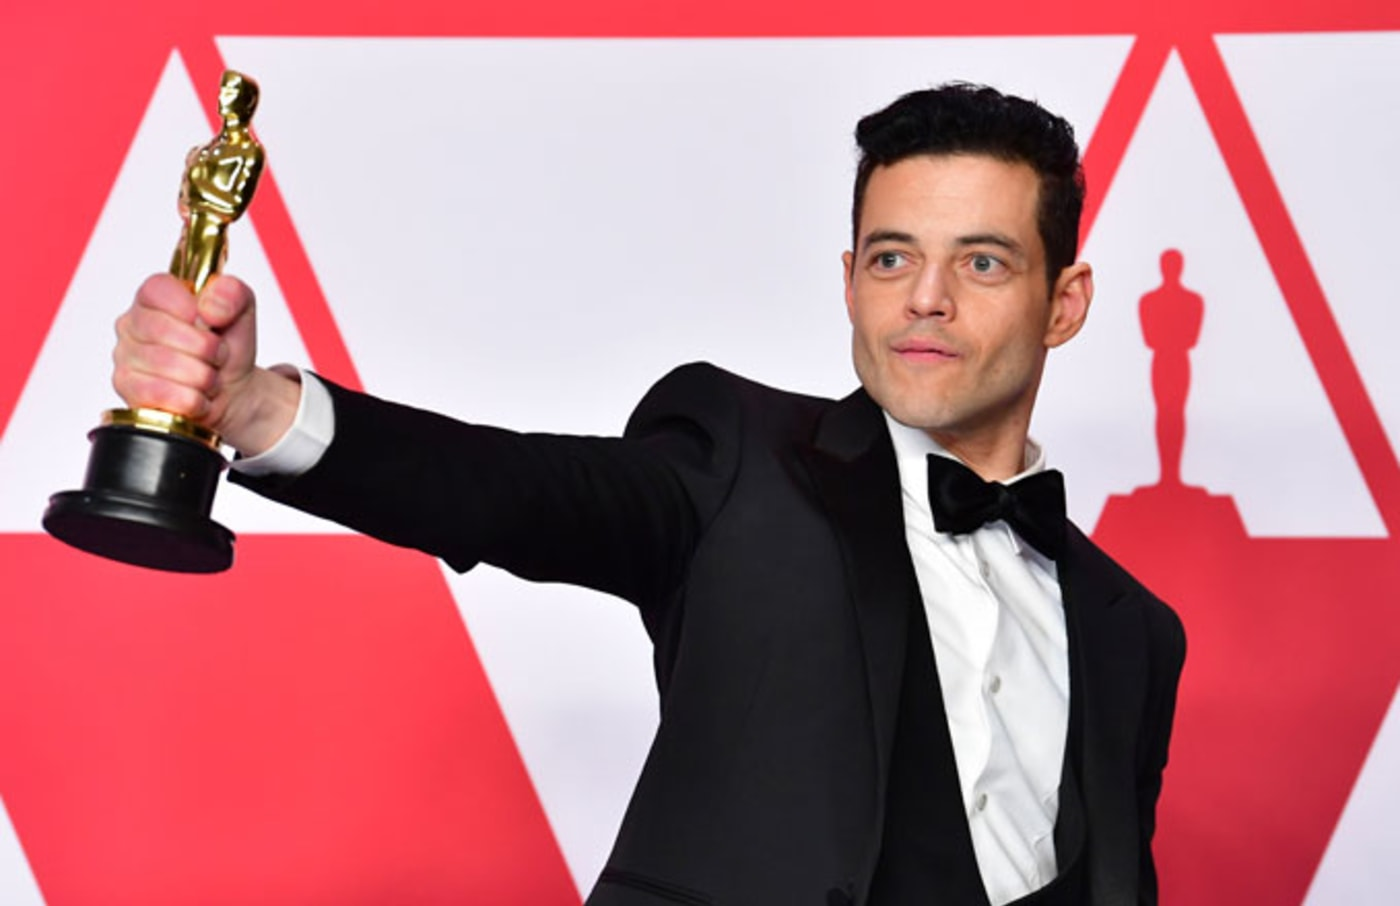 Rami Malek at the Oscars